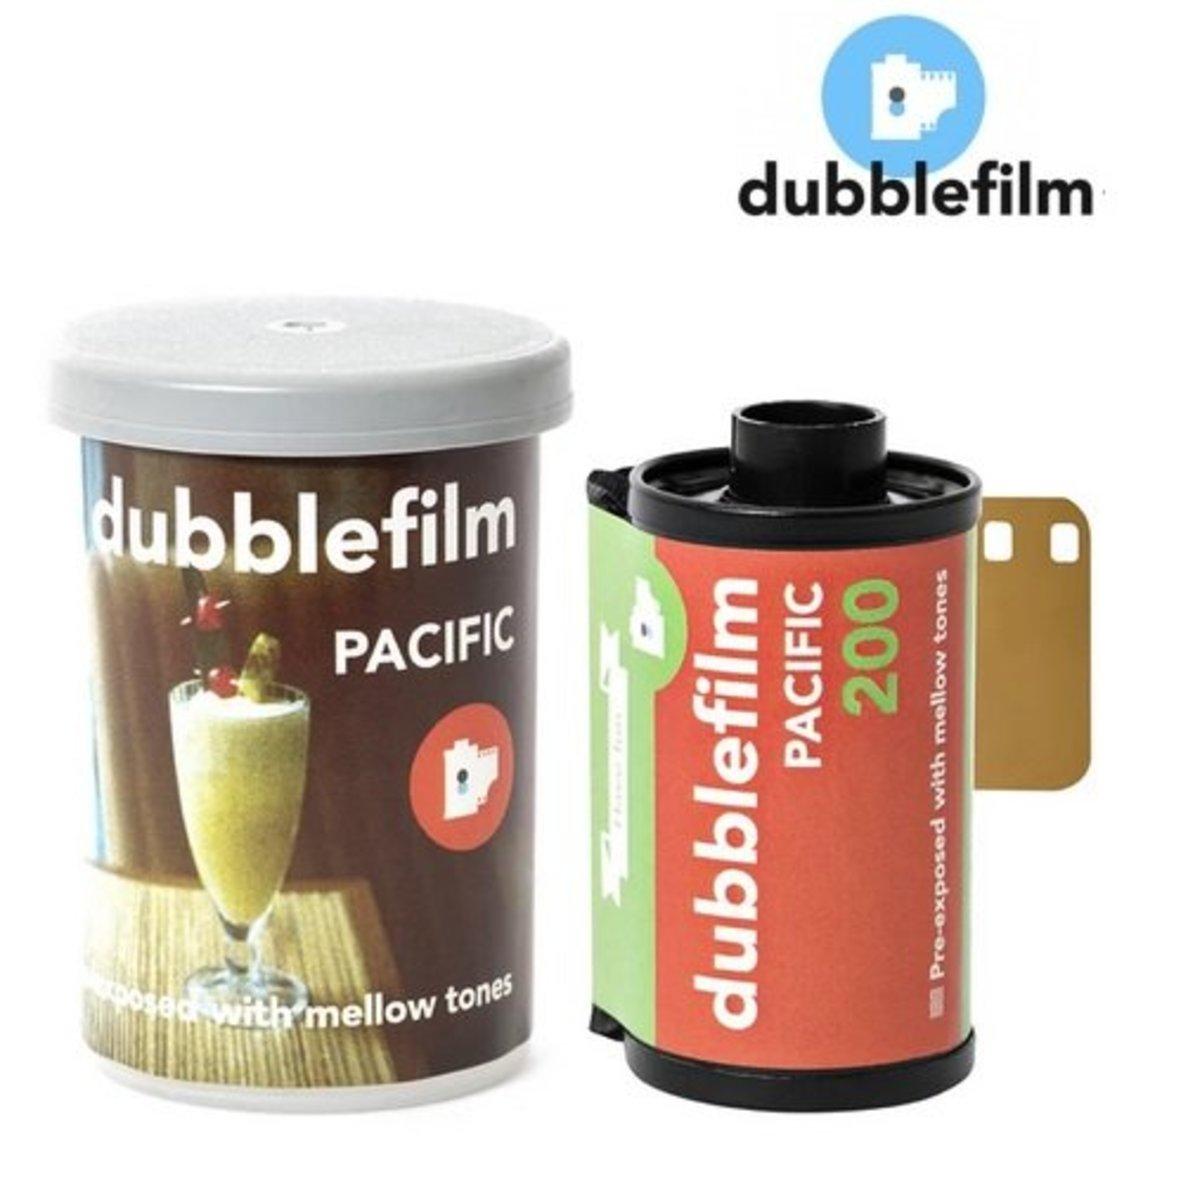 人手捲製 – 新版 dubblefilm PACIFIC  200 ISO 35mm 偏色電影菲林 (36exp)